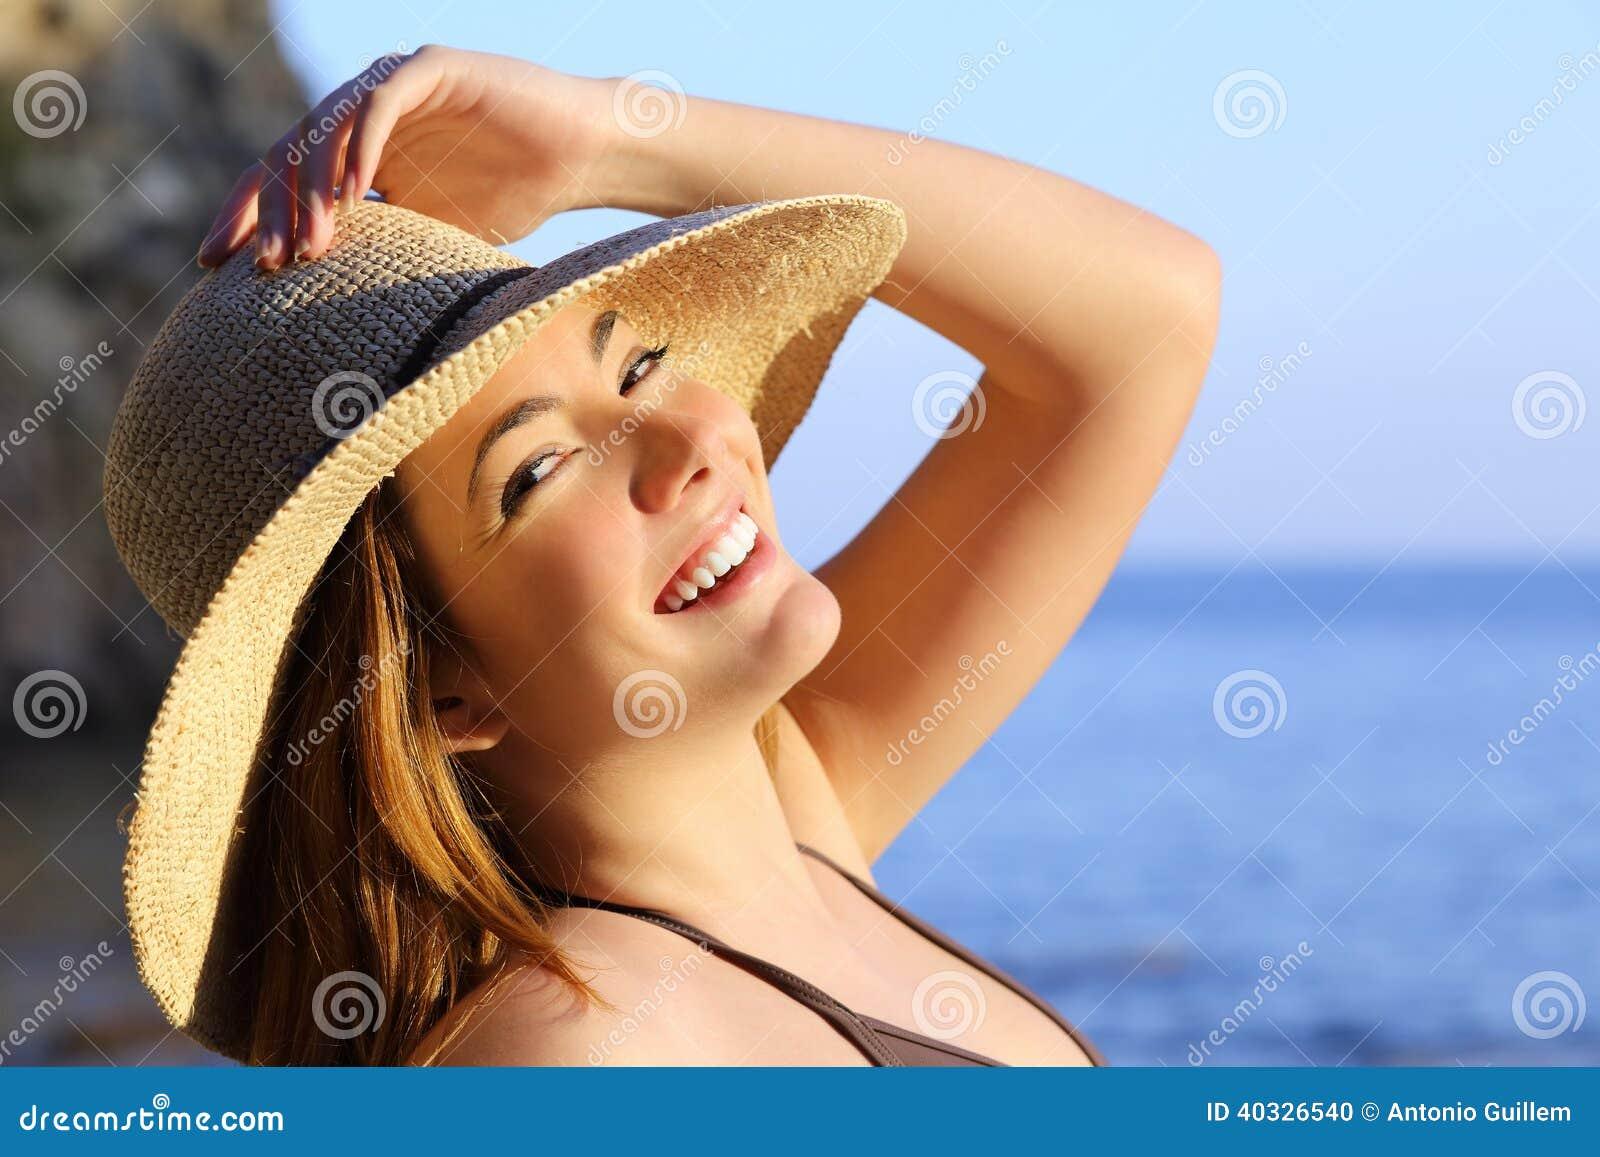 Stående av en lycklig kvinna med perfekt vitt leende på stranden